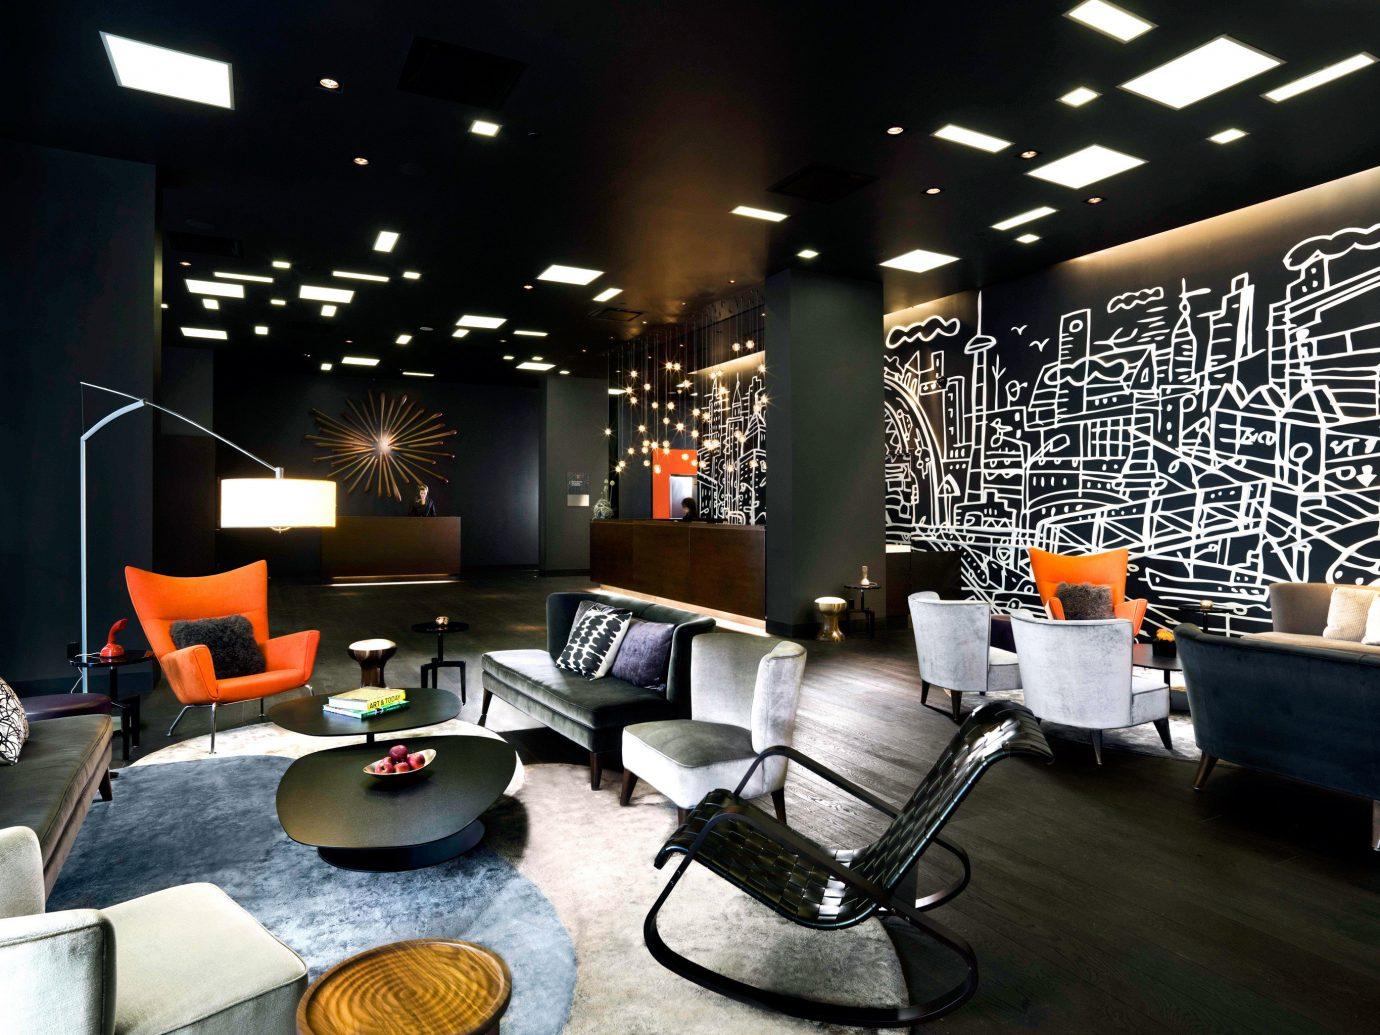 Hotels indoor room floor ceiling Lobby Living living room interior design Design lighting furniture area several